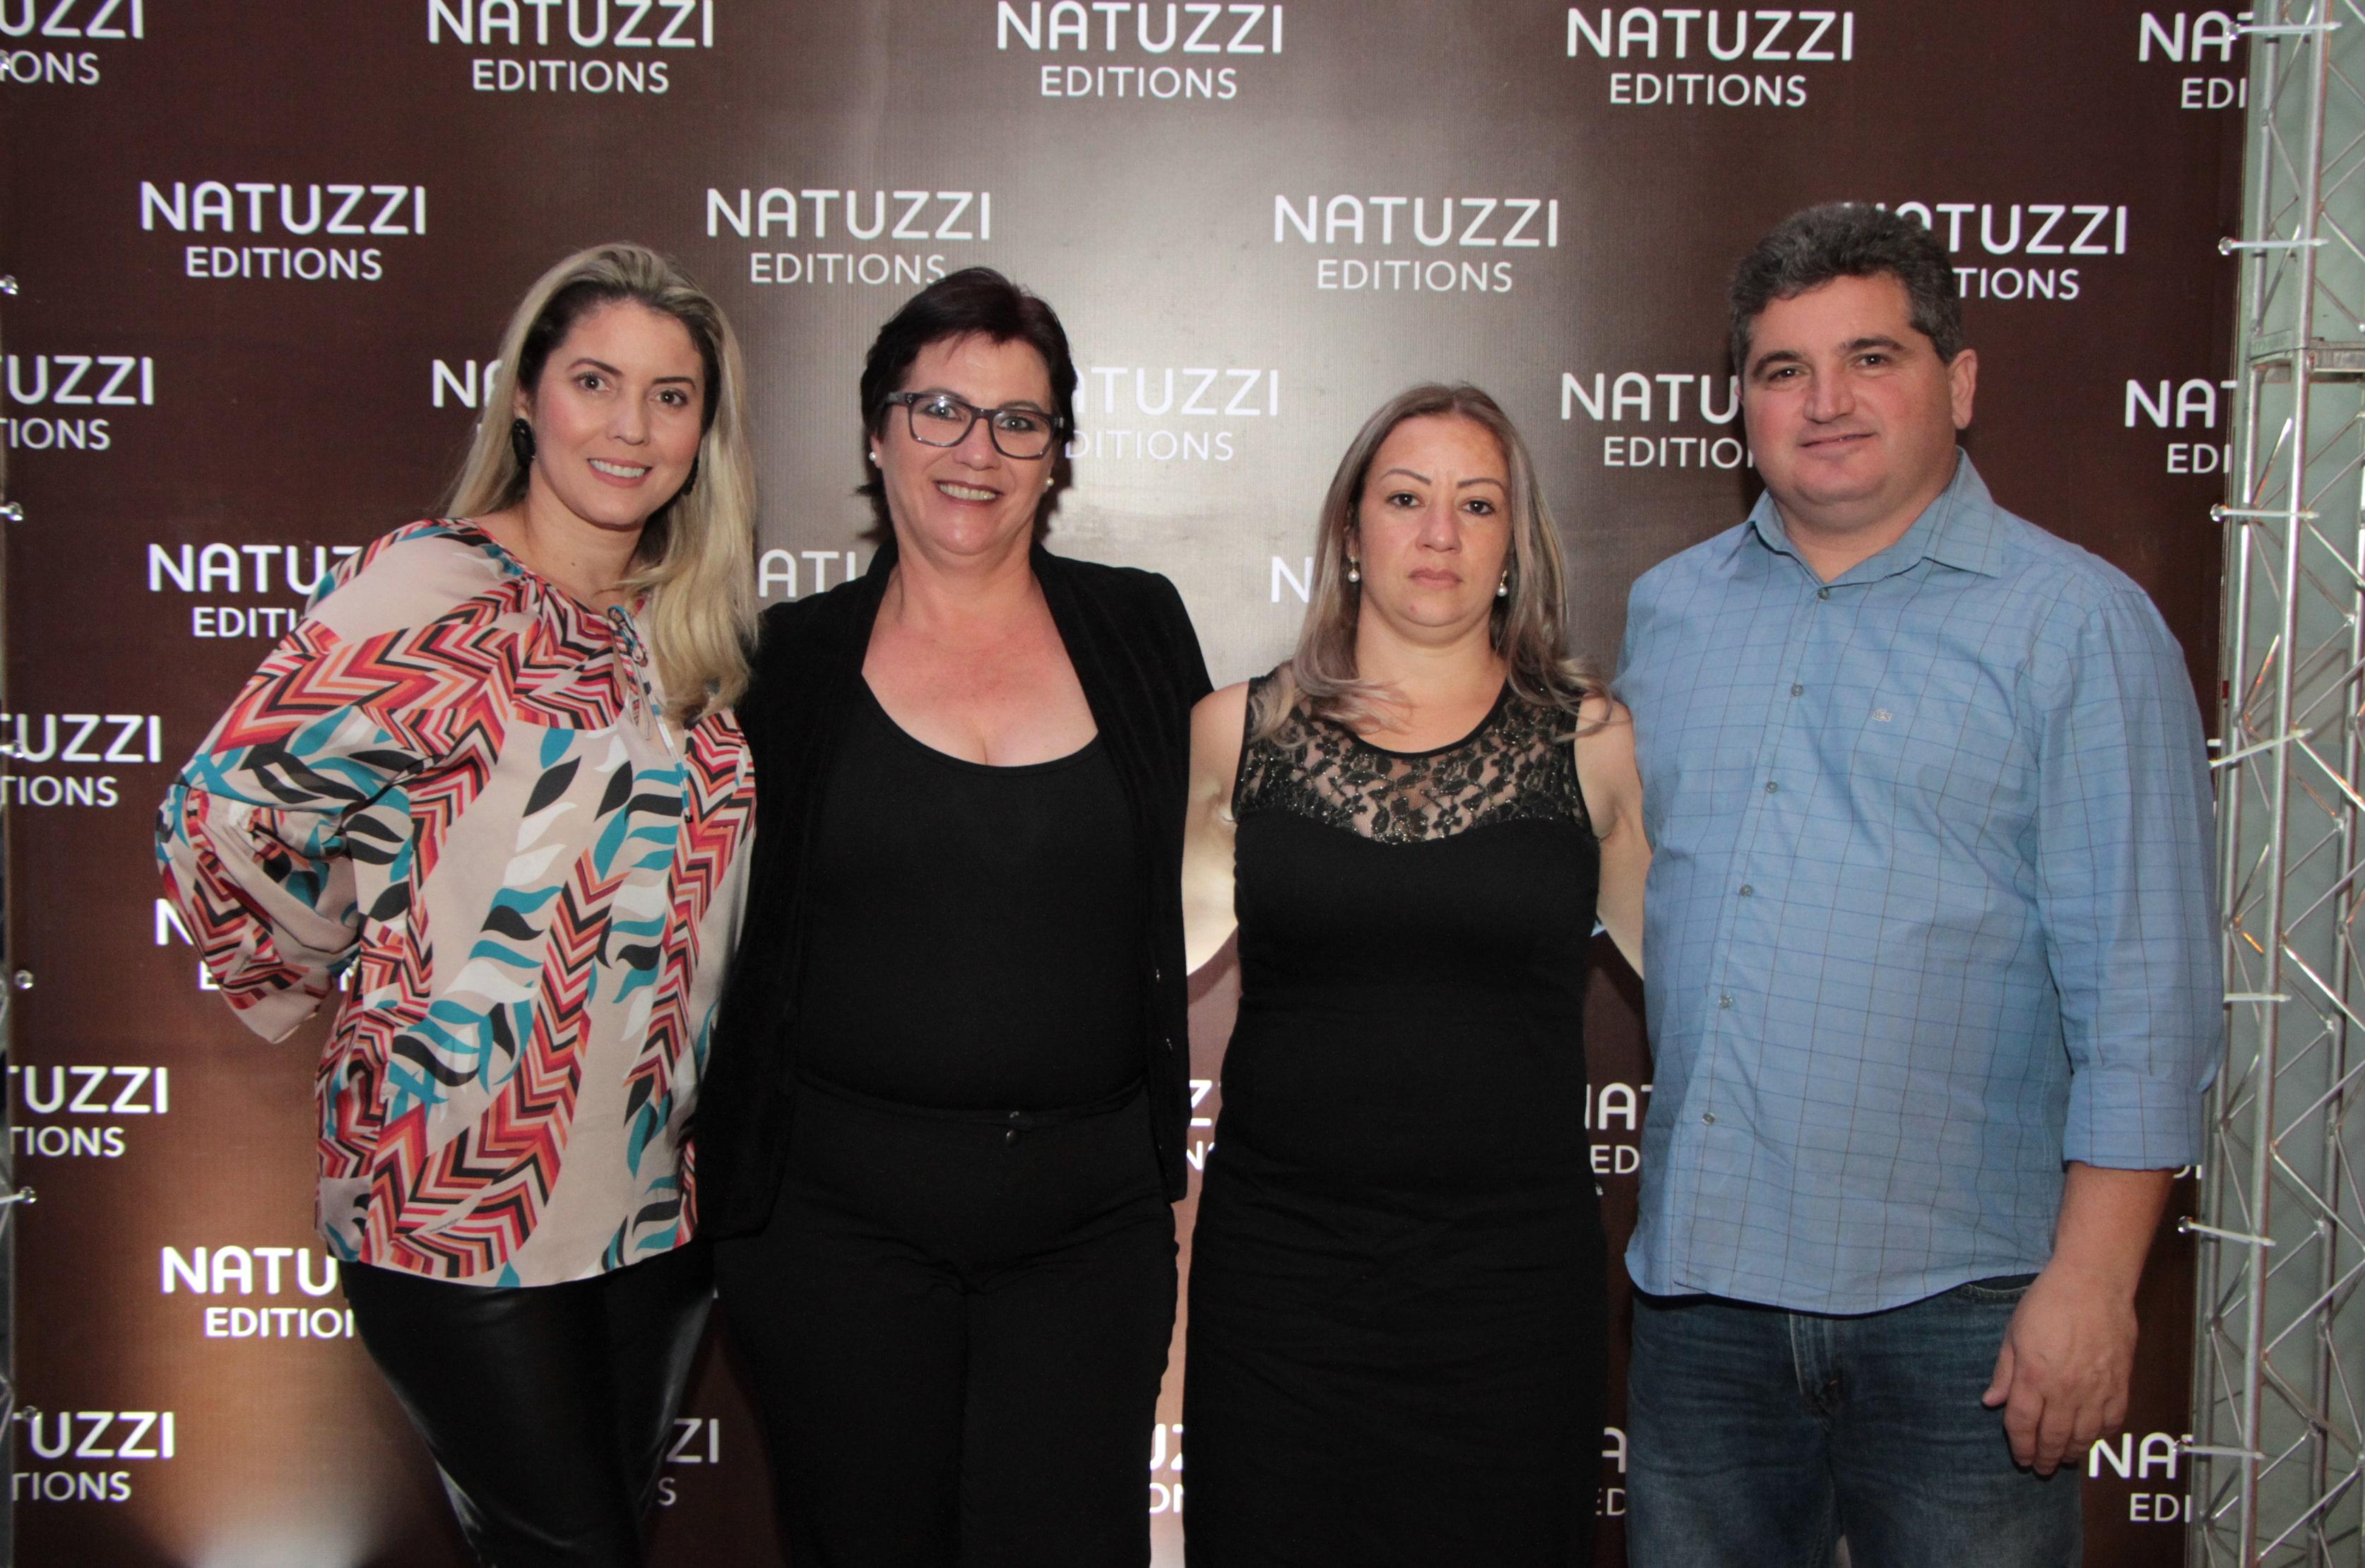 Natuzzi (129)-min.JPG